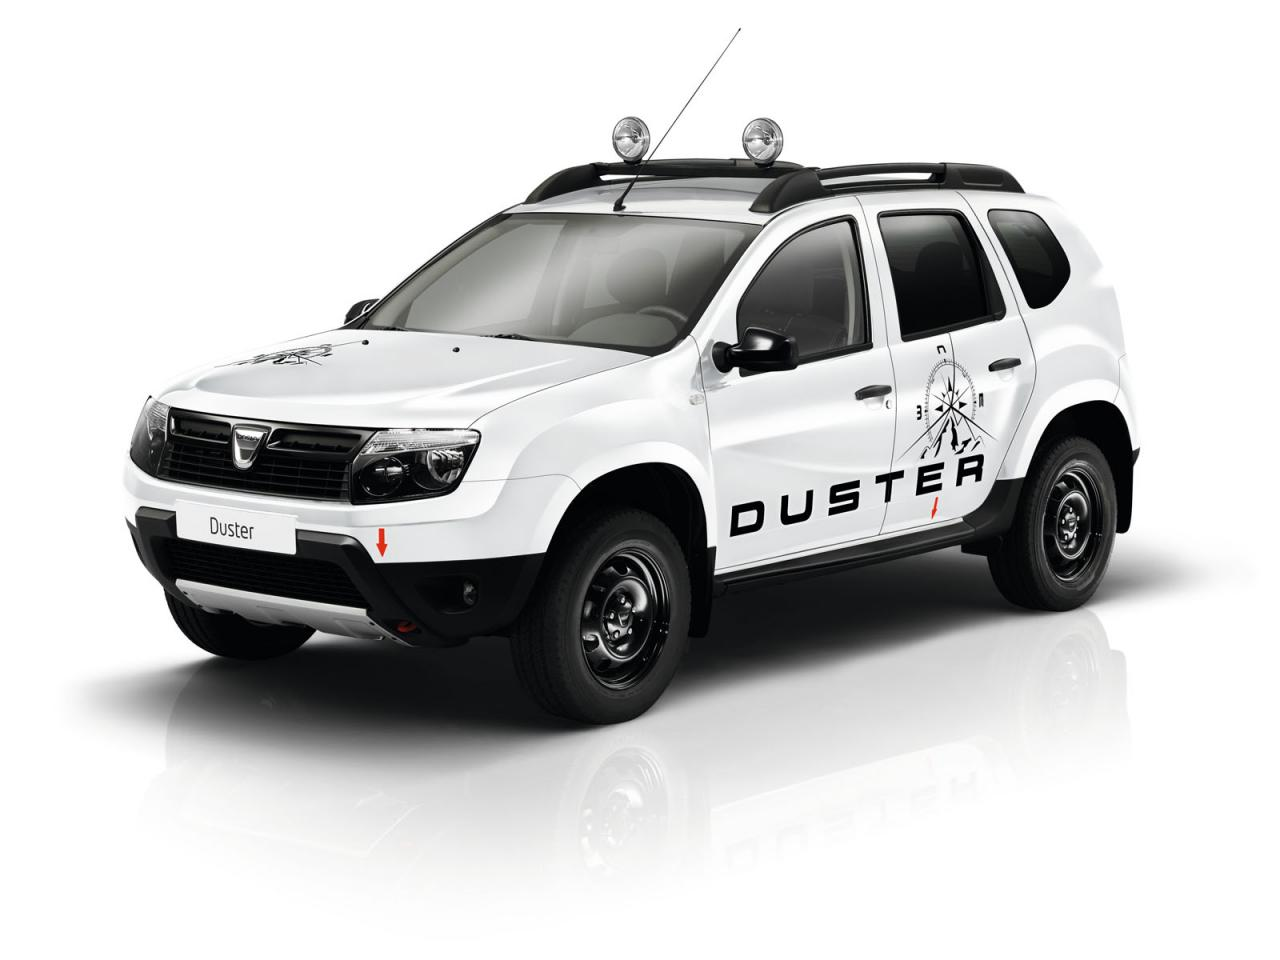 Dacia+Duster+Aventure+Edition+1.jpg